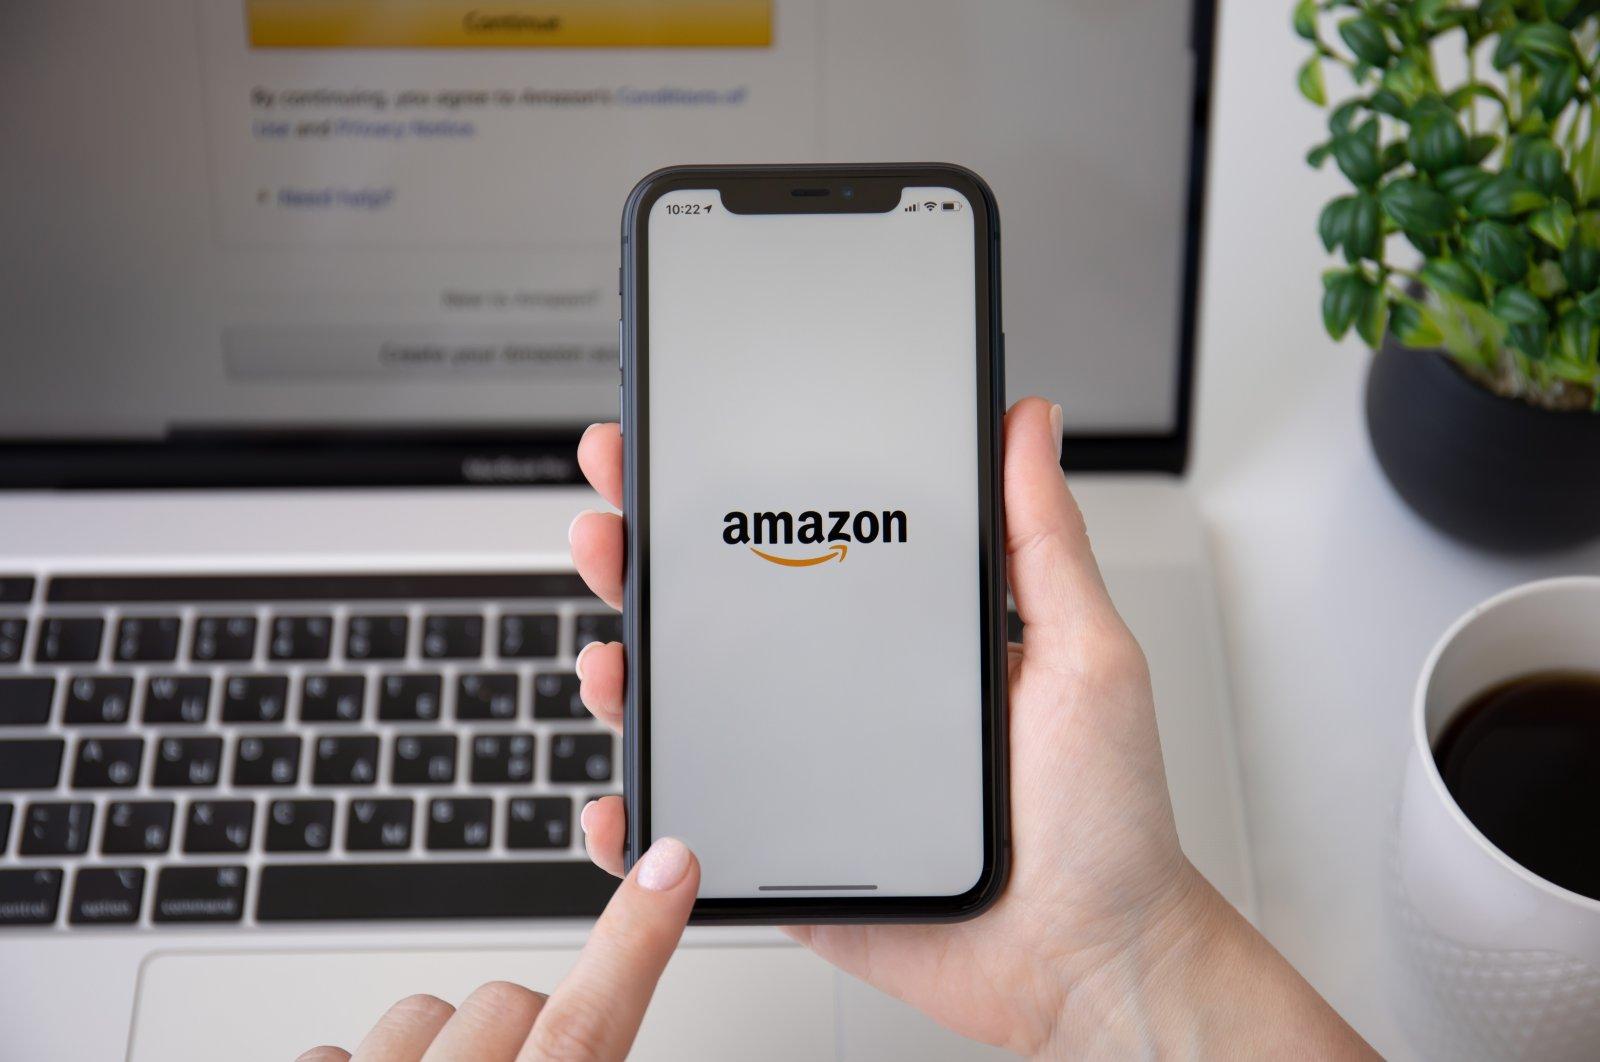 Amazon has long-term plans in Turkey